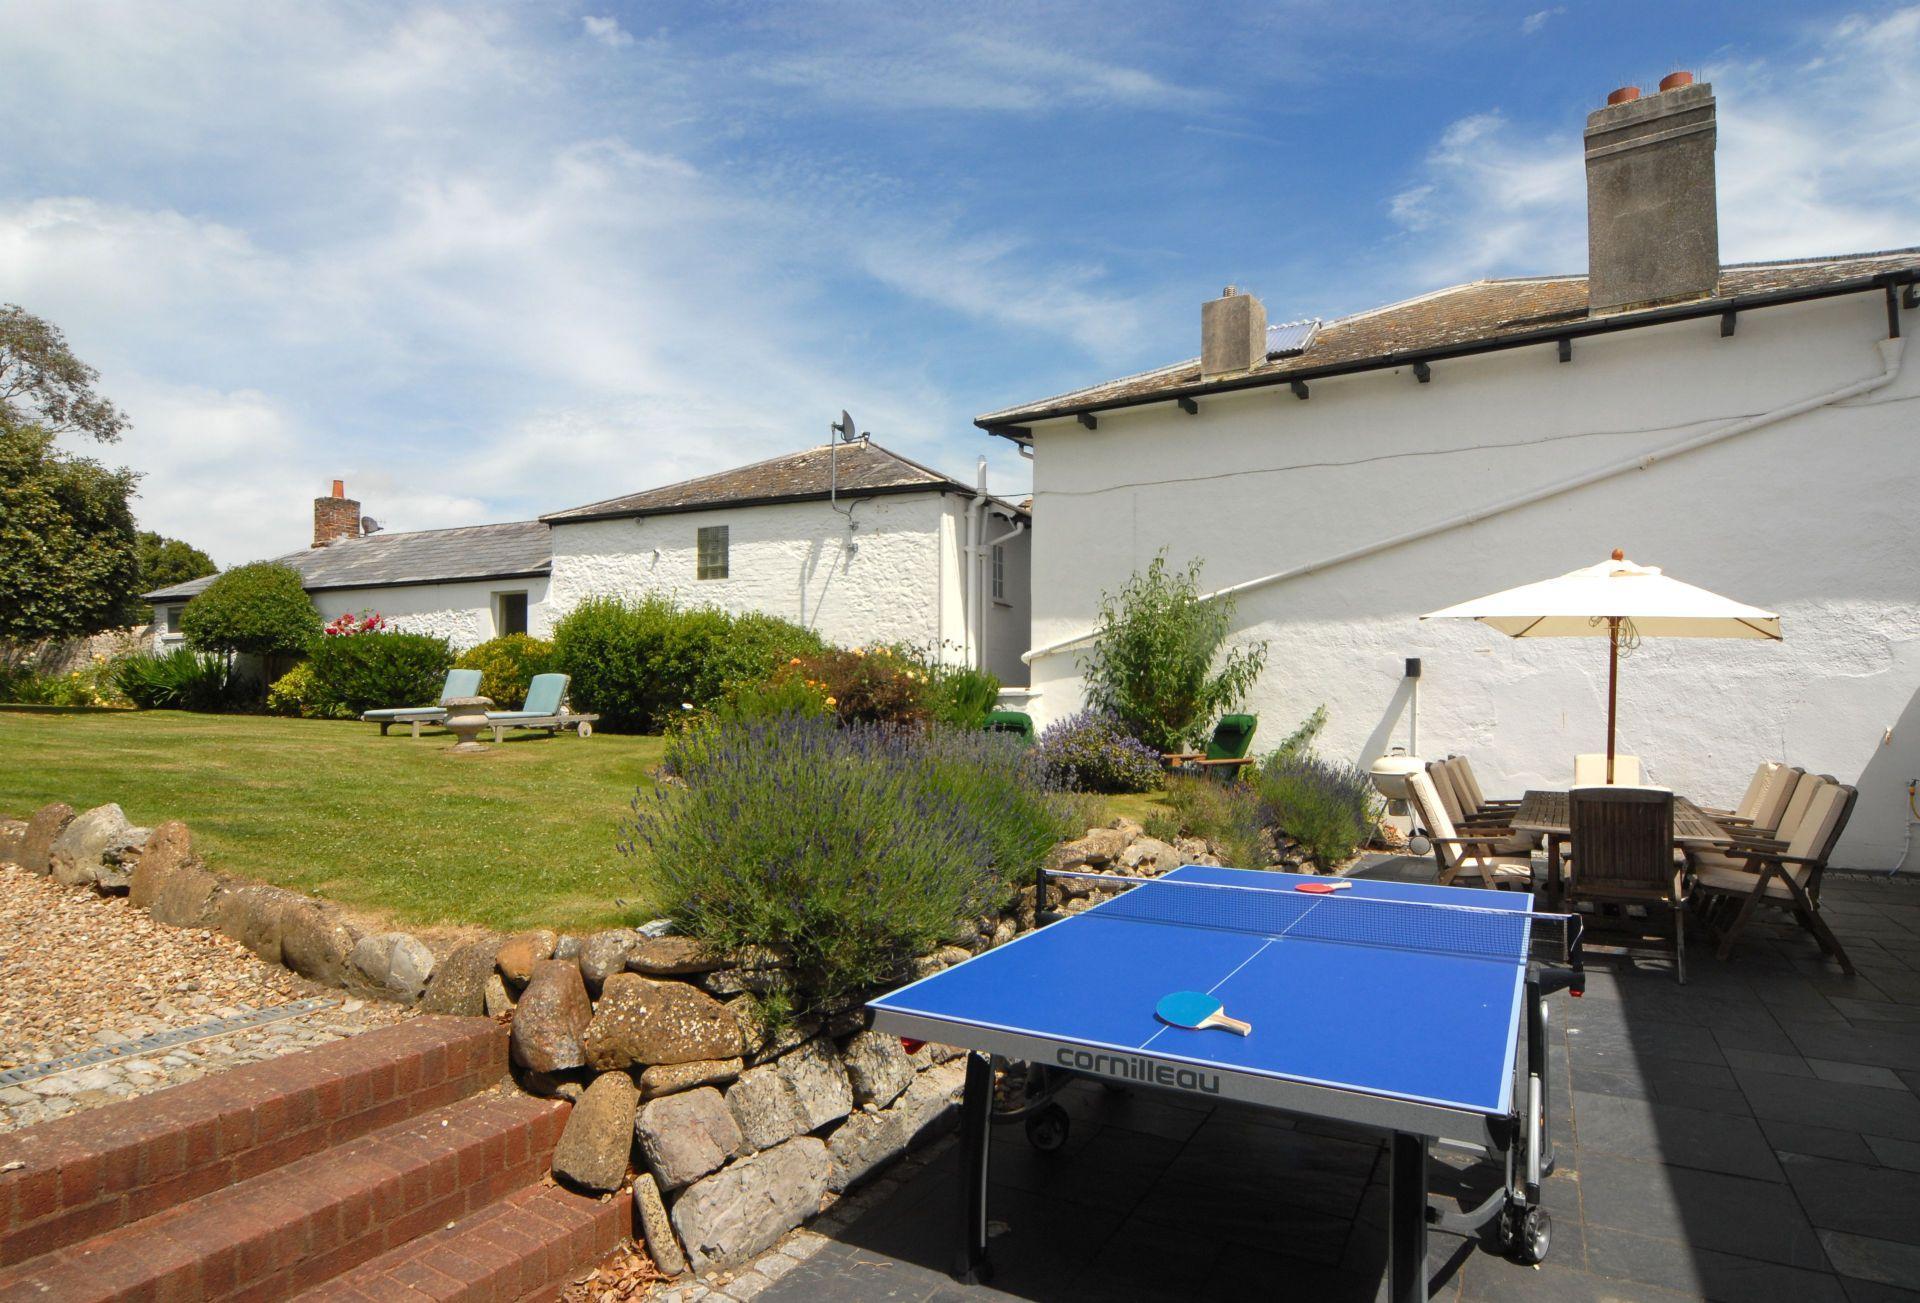 Garden with table tennis